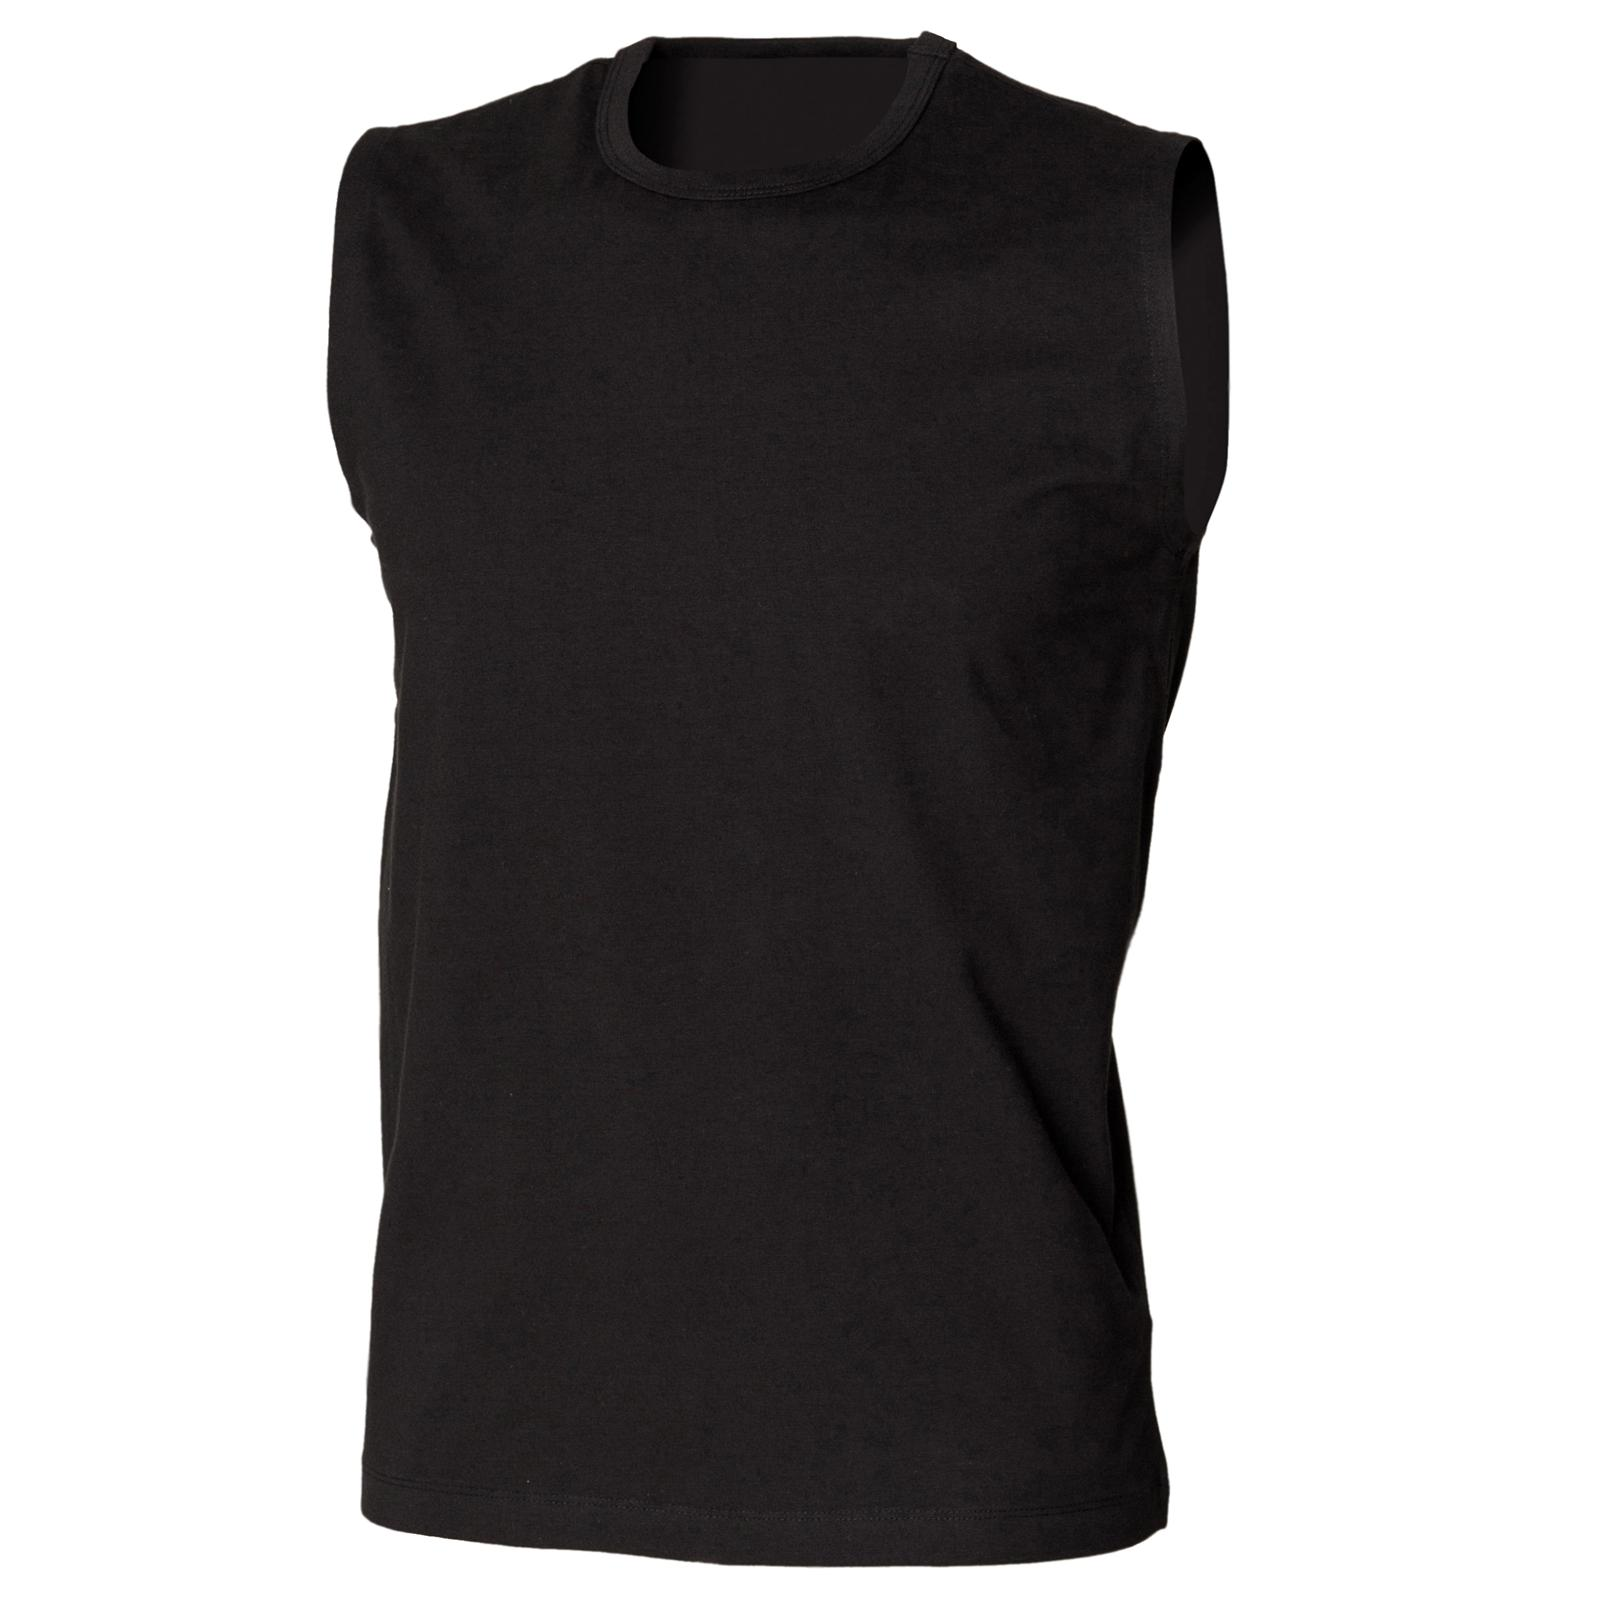 Black t shirt xl - New Skinni Fit Mens Stretch Sleeveless T Shirt Vest Top In Black White S Xl